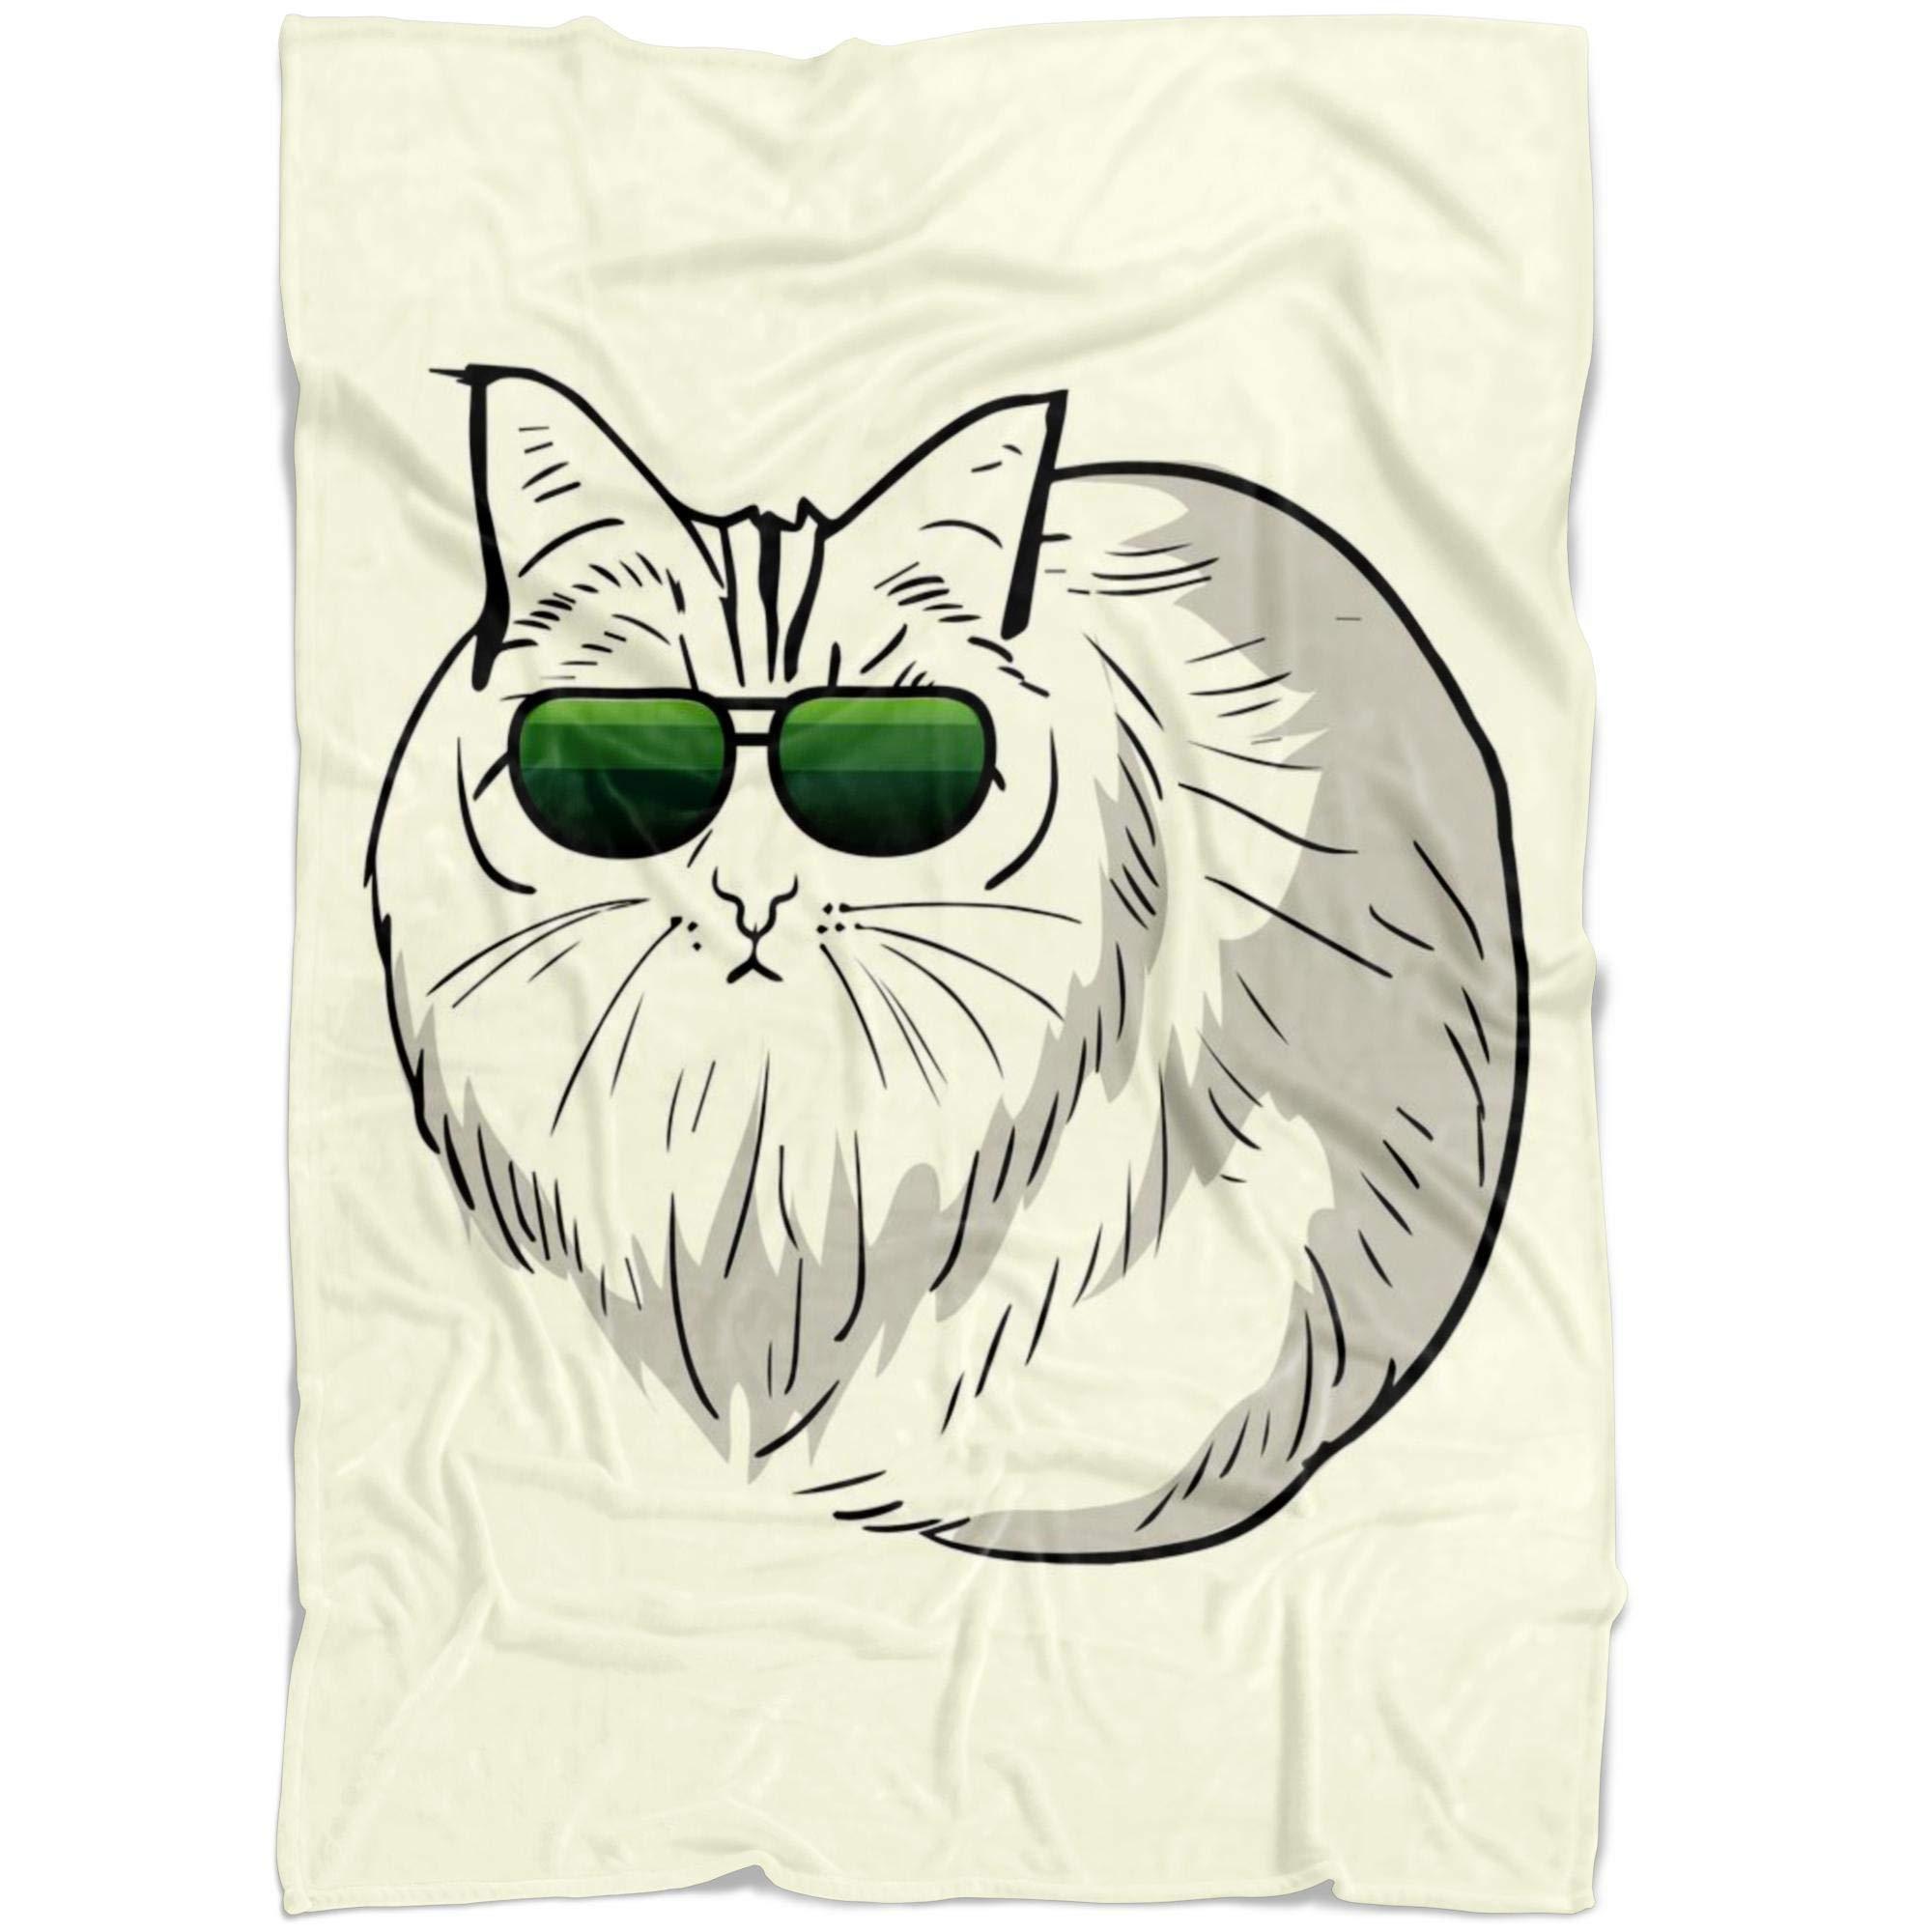 Weezag Birman Funny Cat Fleece Throw Blanket, Cute Pet Gifts 9188A, Medium 60''x50'' by Weezag (Image #1)